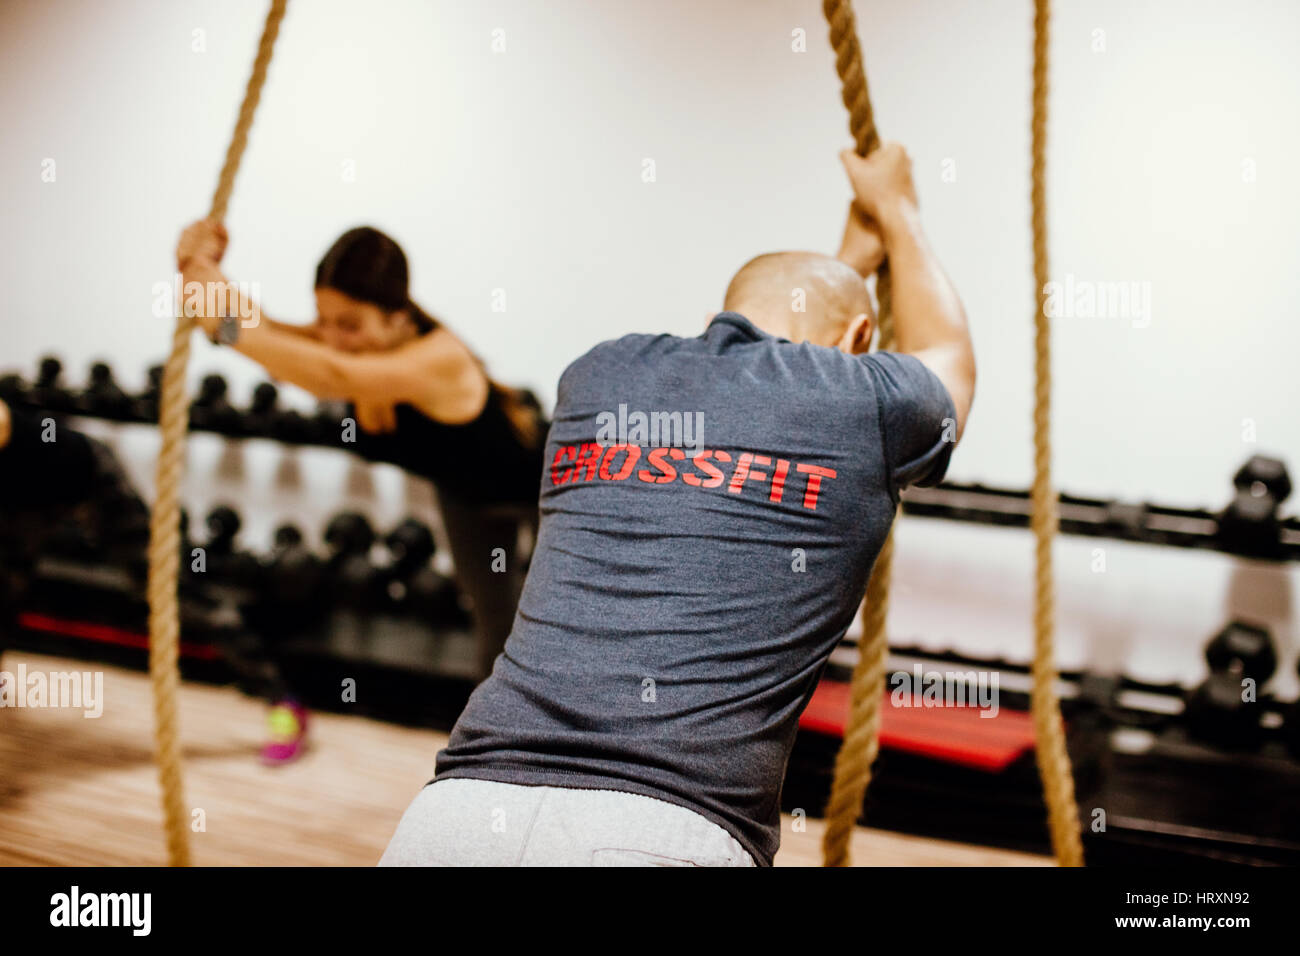 crossfit group training. Group training indoors. - Stock Image